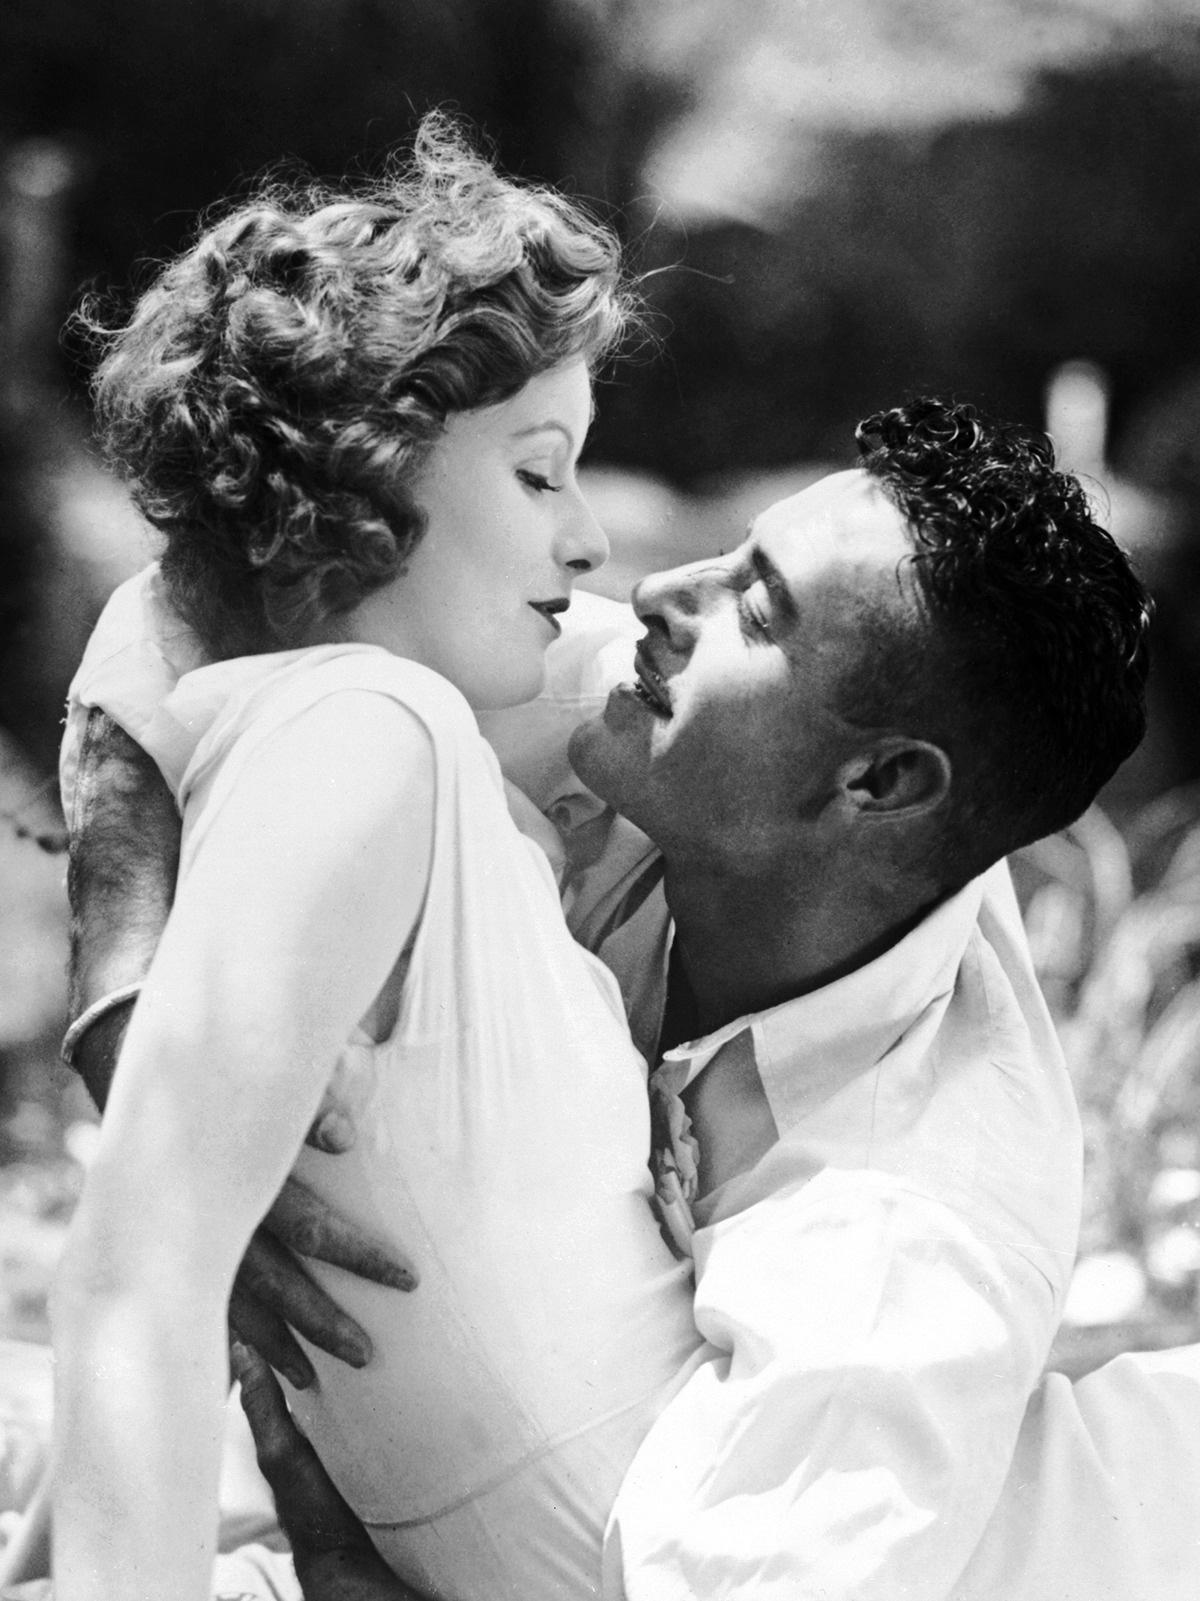 greta-garbo-and-john-gilbert-in-love-1927.jpg